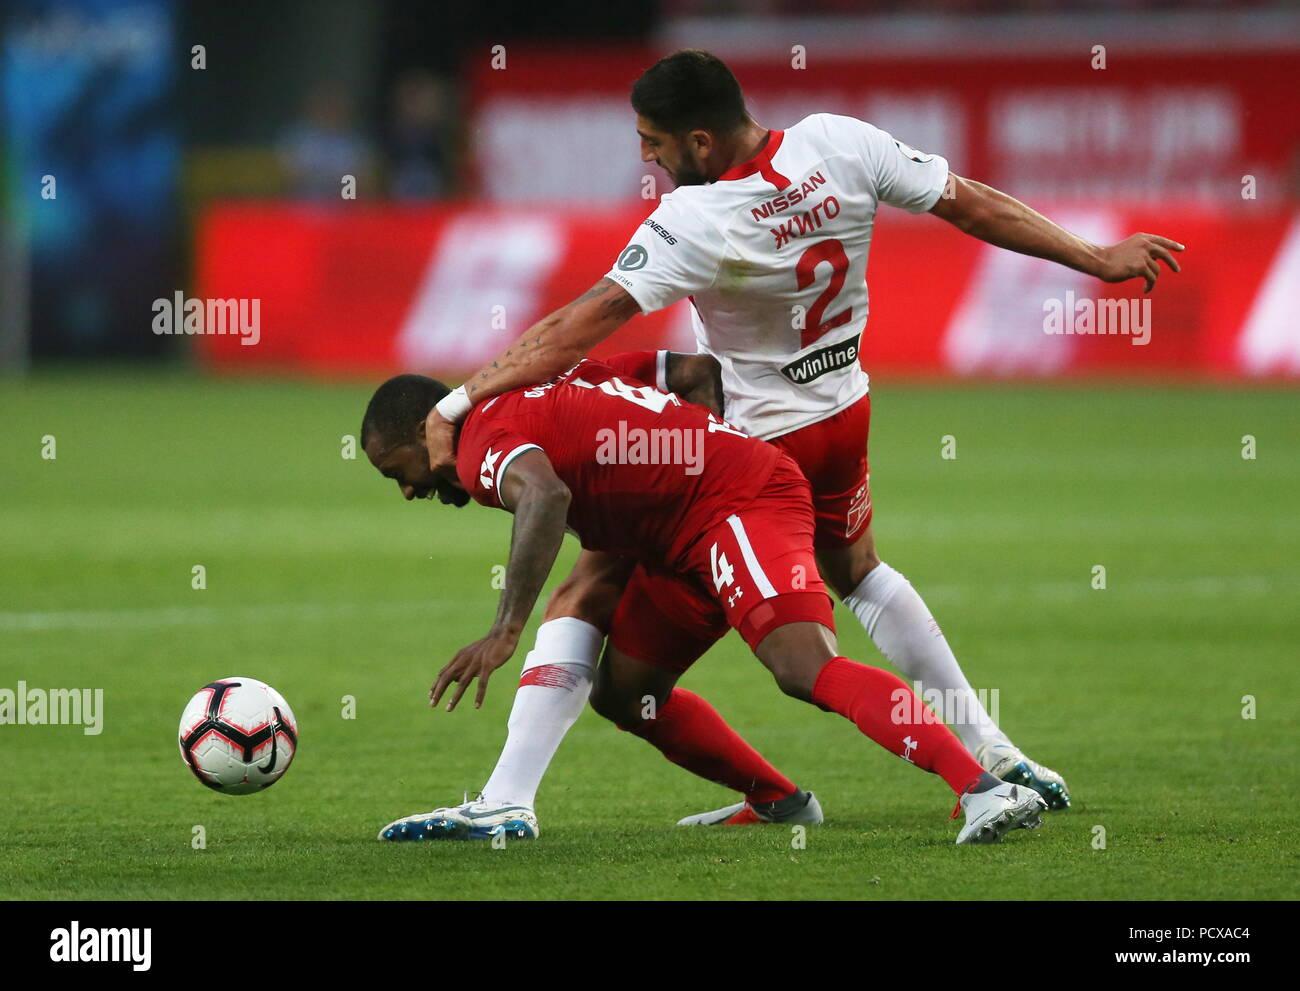 Match Spartak - Lokomotiv 2018 47